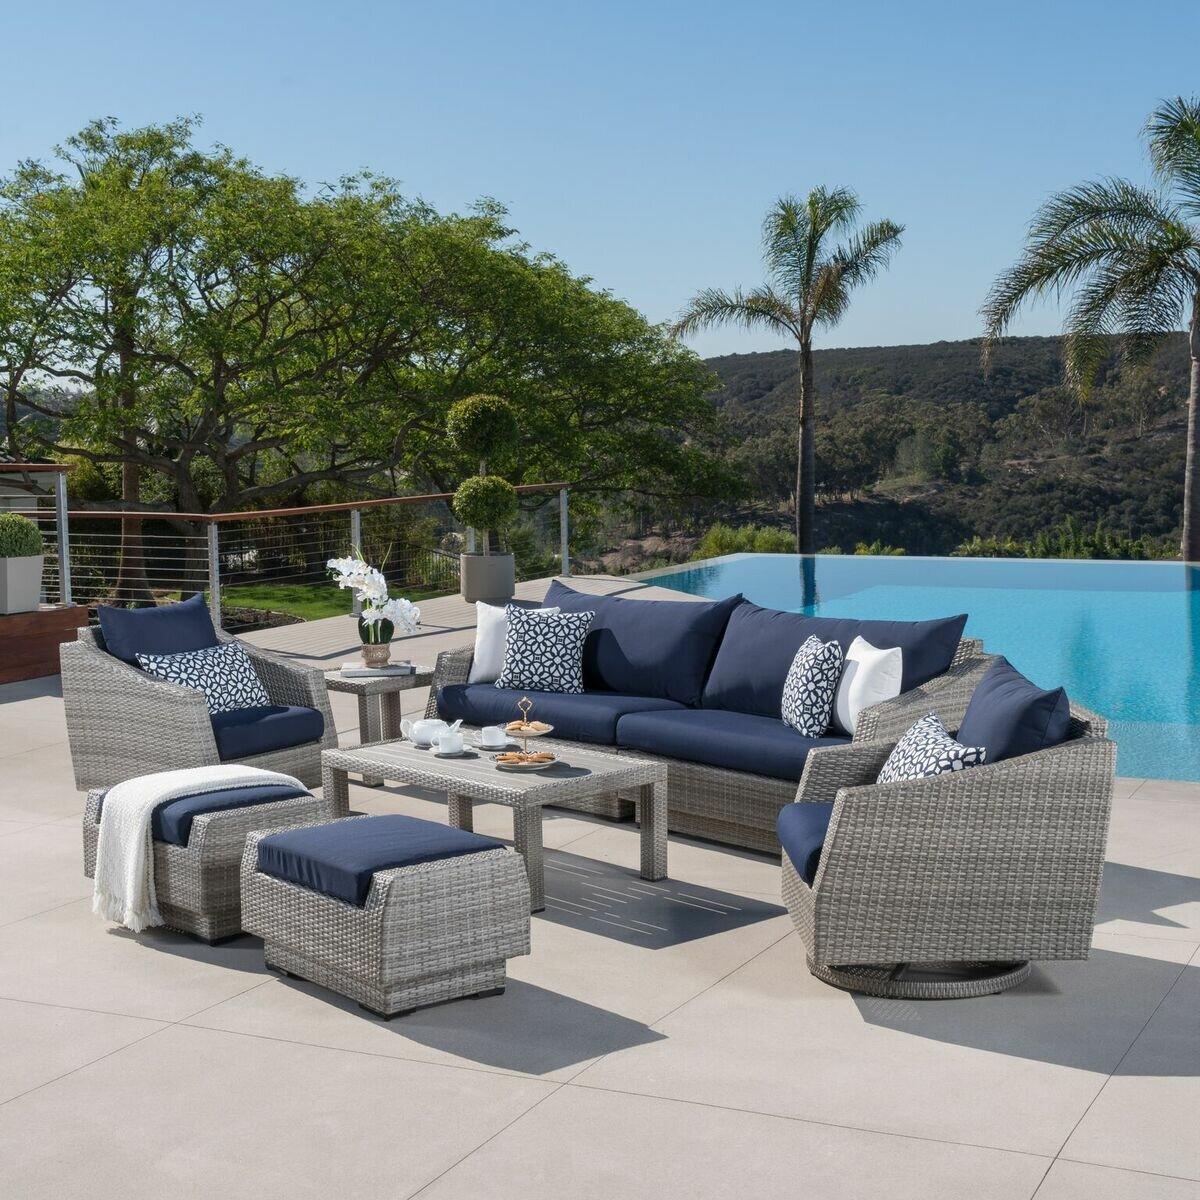 Johana 8 Piece Rattan Sunbrella Sofa Seating Group With Cushions Reviews Allmodern